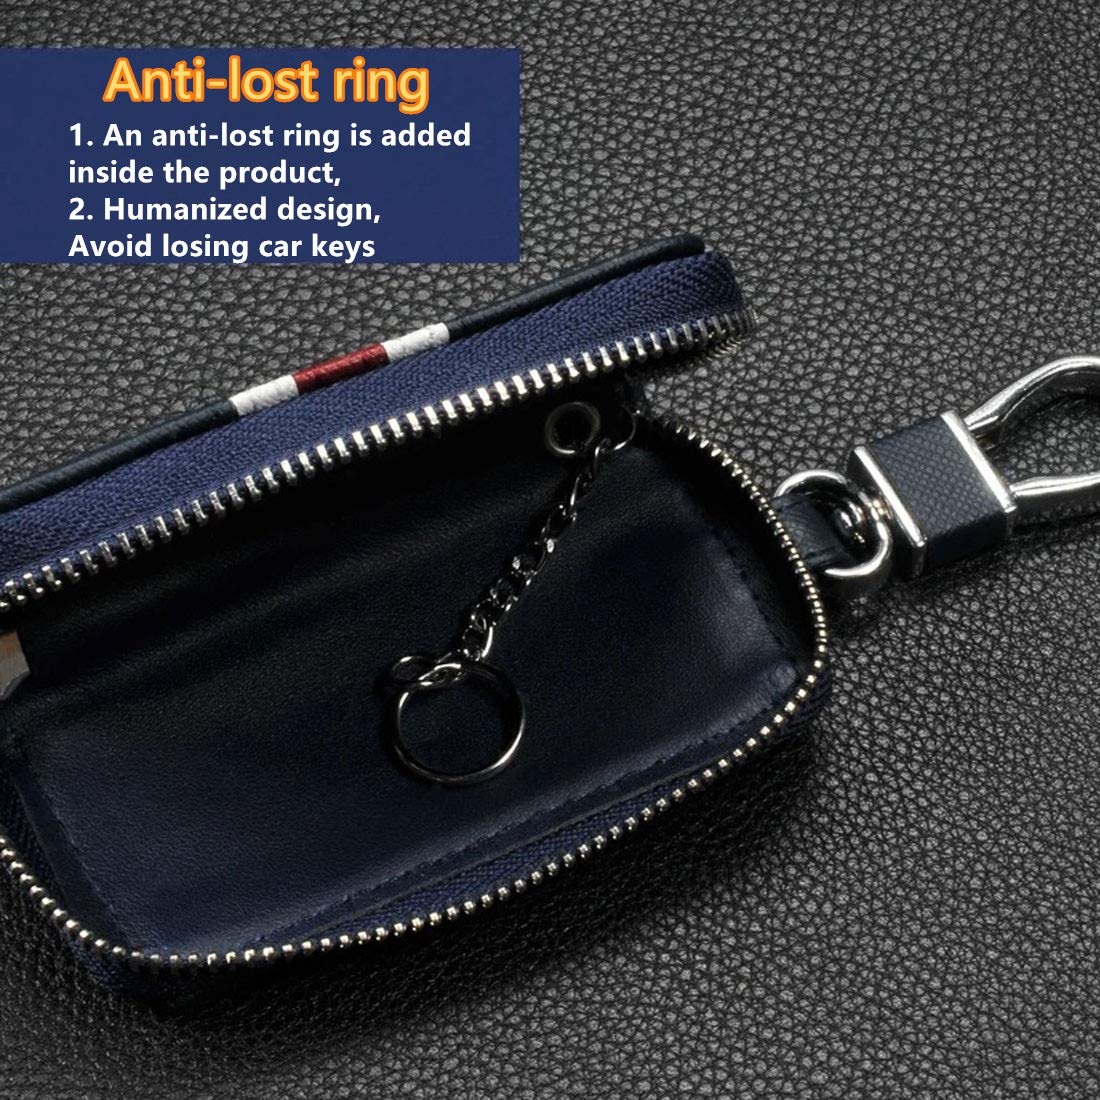 Blue WeChance Universal Car Key case Bag Wallet,Superior Stripe Genuine Leather Car Smart Key Chain Keychain Holder Metal Hook and Keyring Fashion Zipper Bag for Remote Key Fob